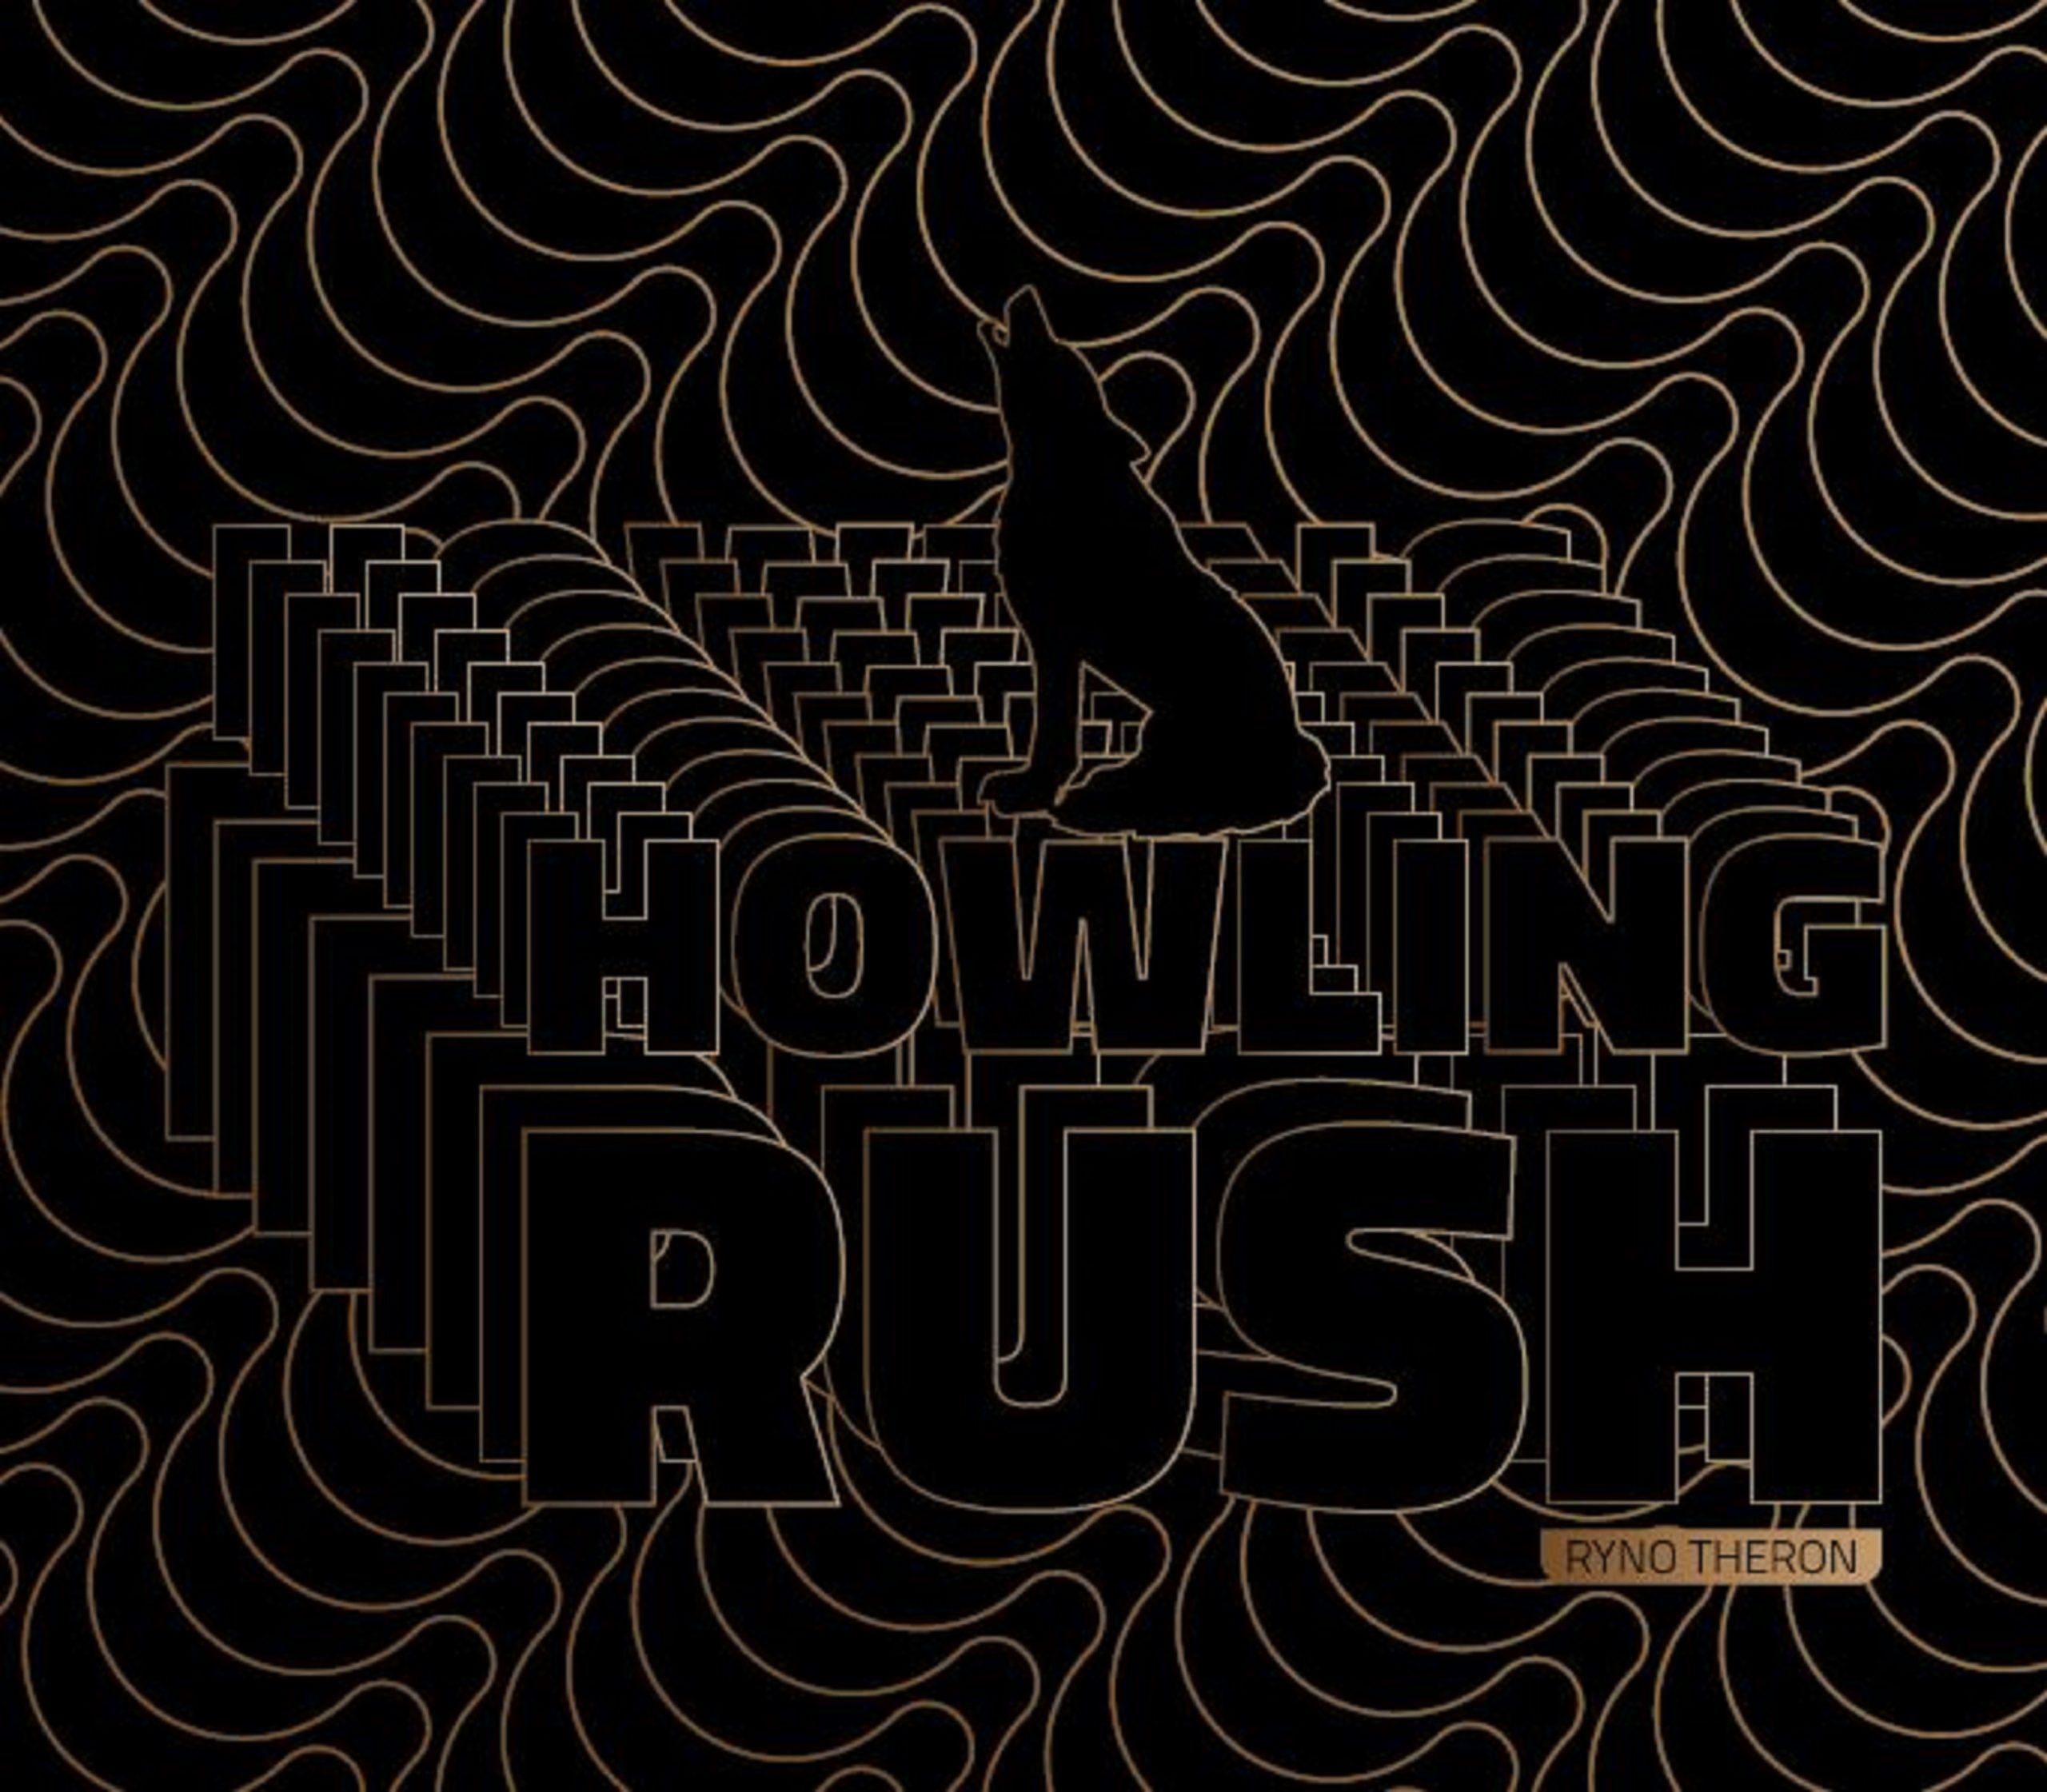 Howling Rush - Ryno Theron